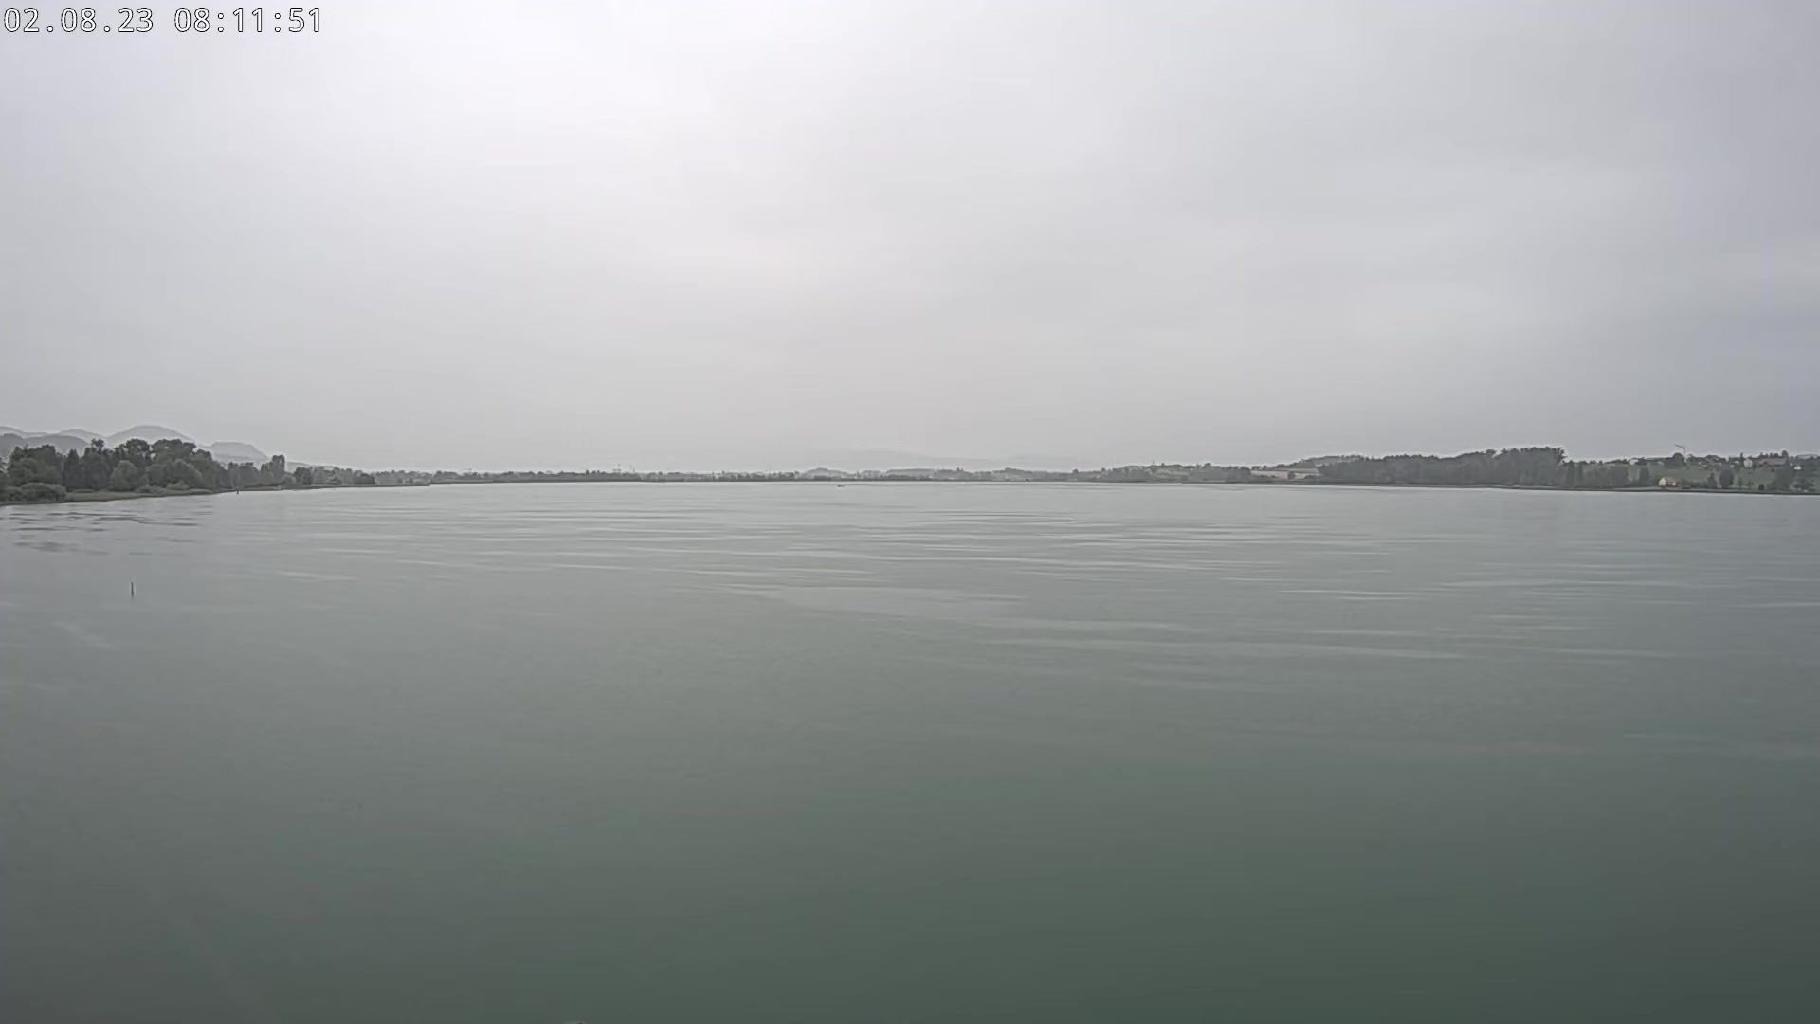 Pfäffikon › Süd: Seerettungsdienst Pfäffikon ZH (Im Notfall Tel. 118) - Naturzentrum Pfäffikersee